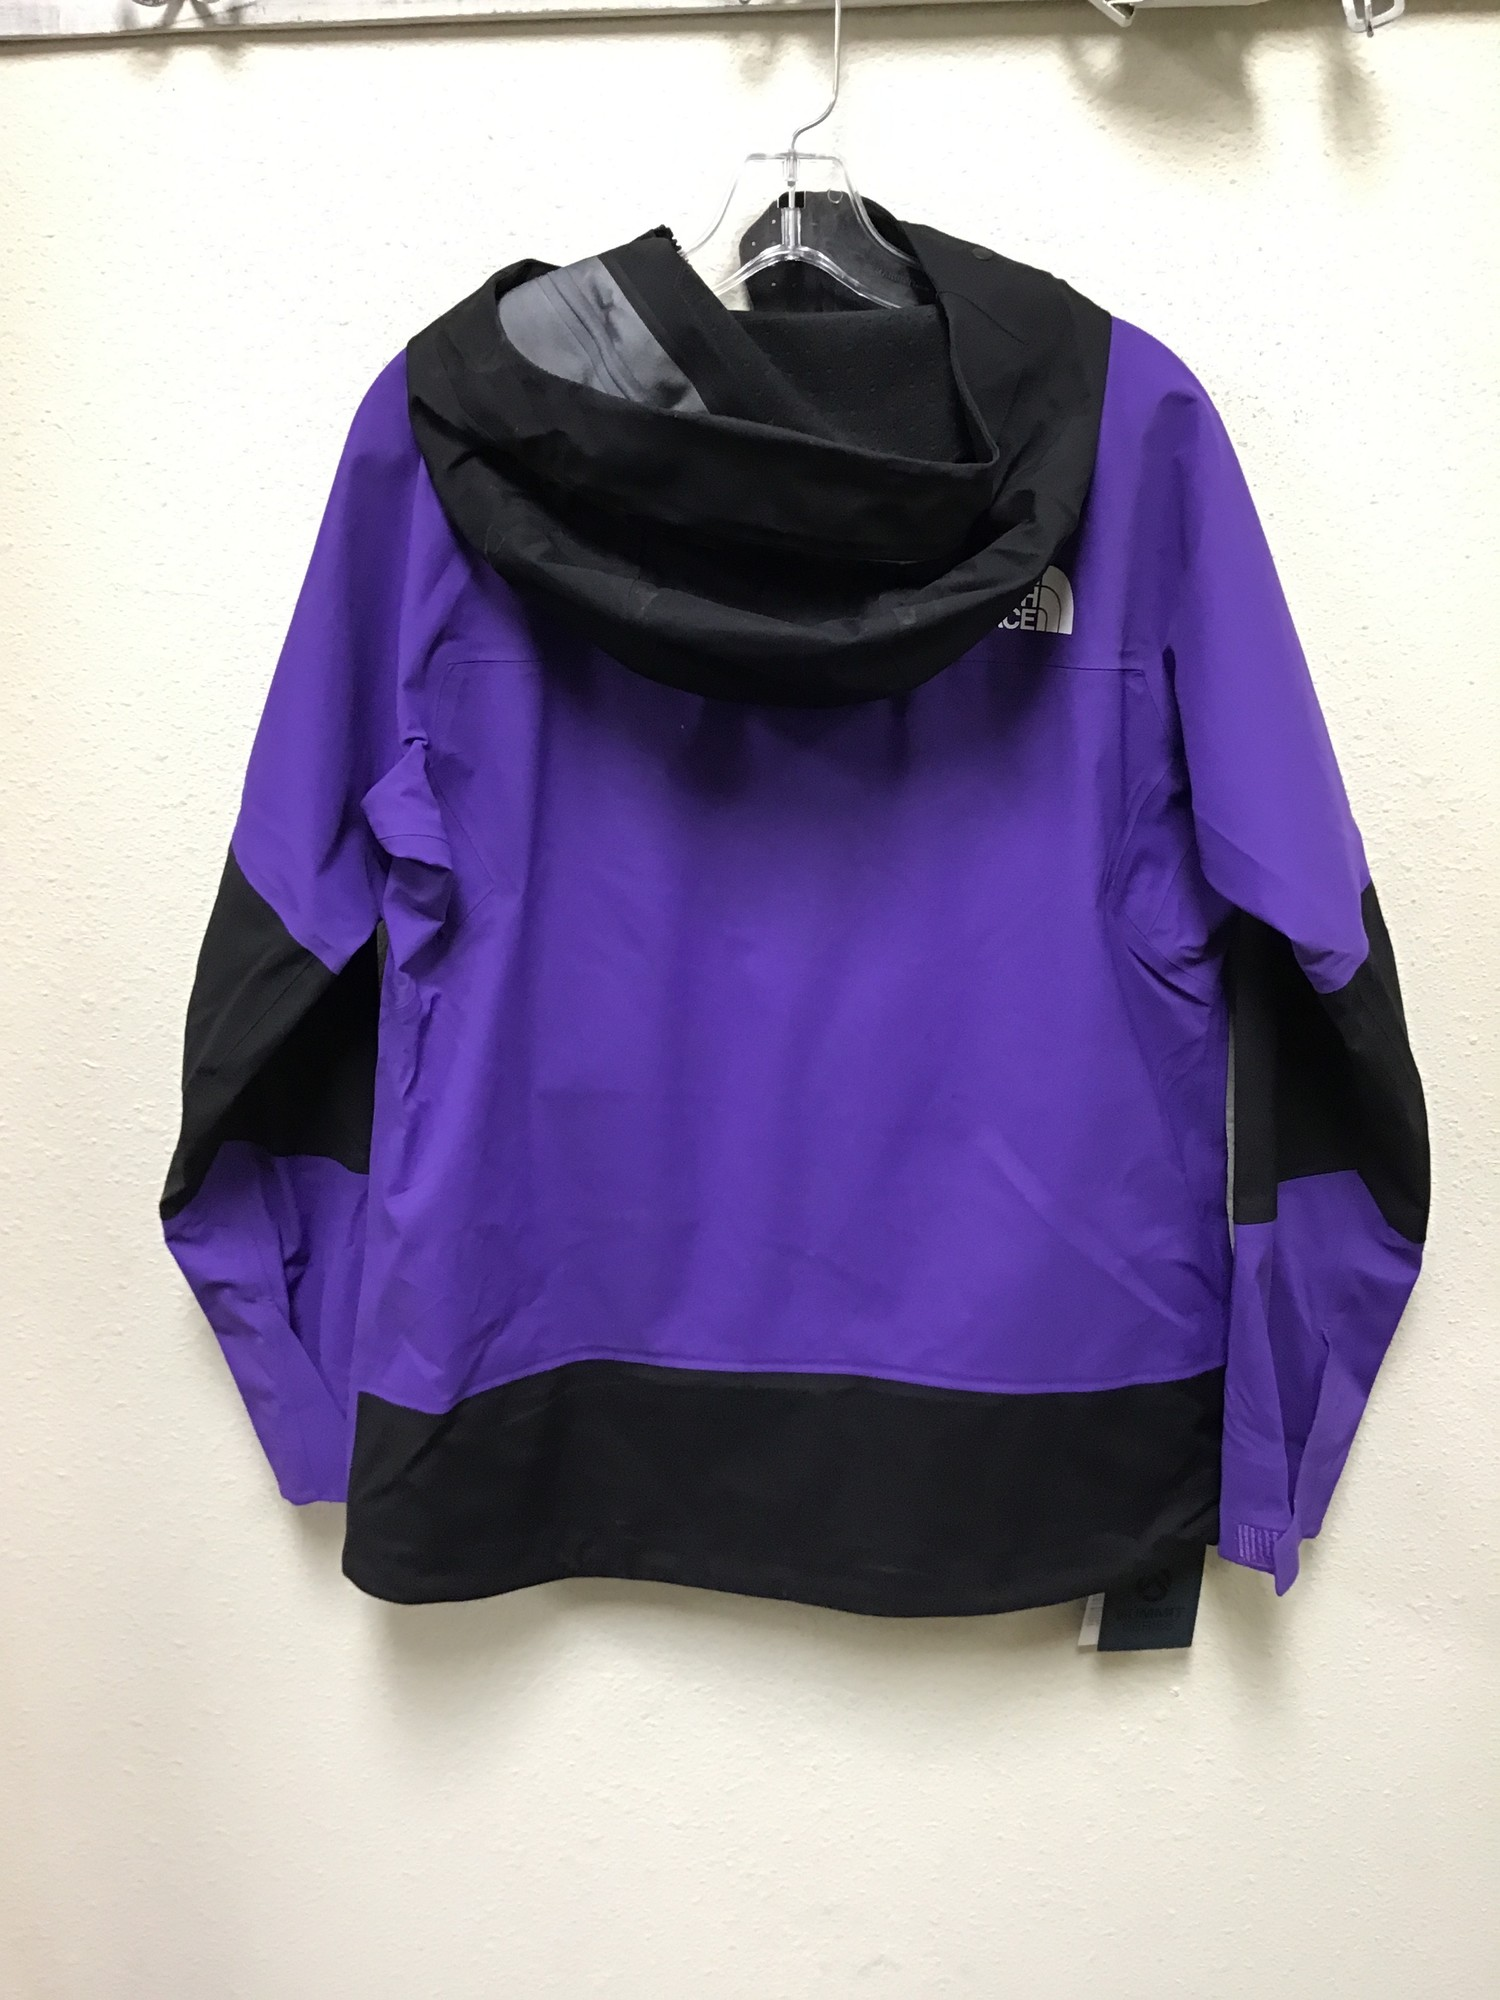 WN North Face Summit Series Ski/Alpine Jacket, Prp/Blk, Size: M